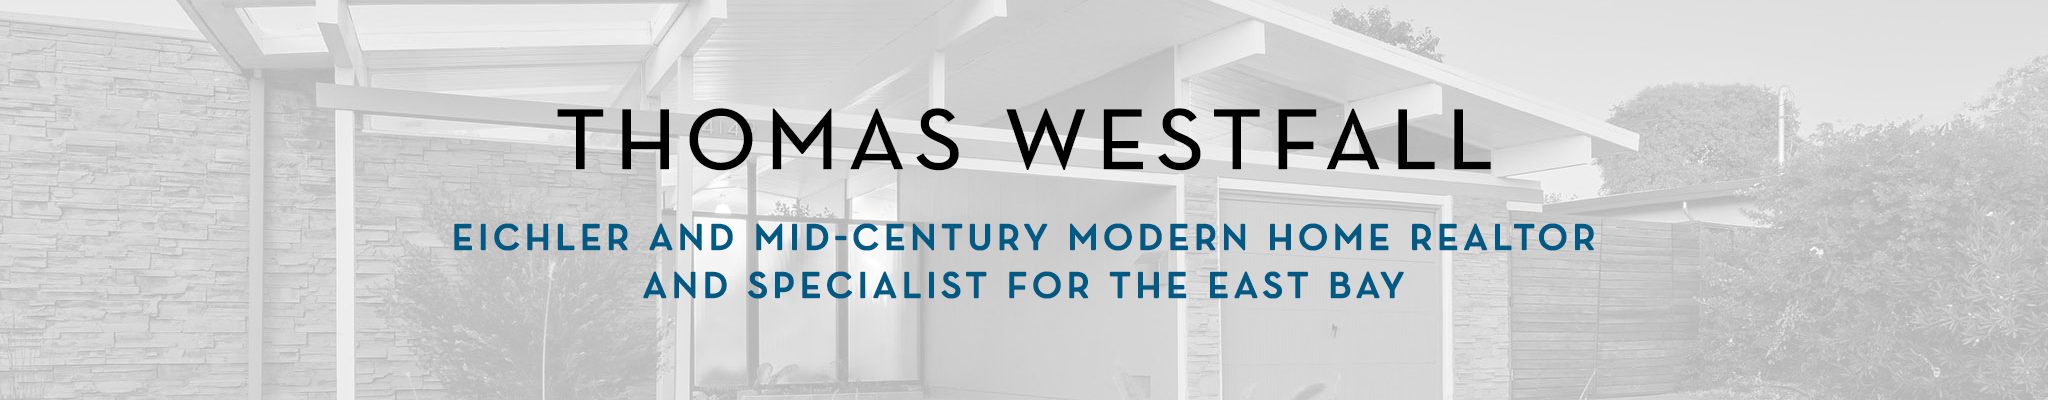 Thomas Westfall Logo